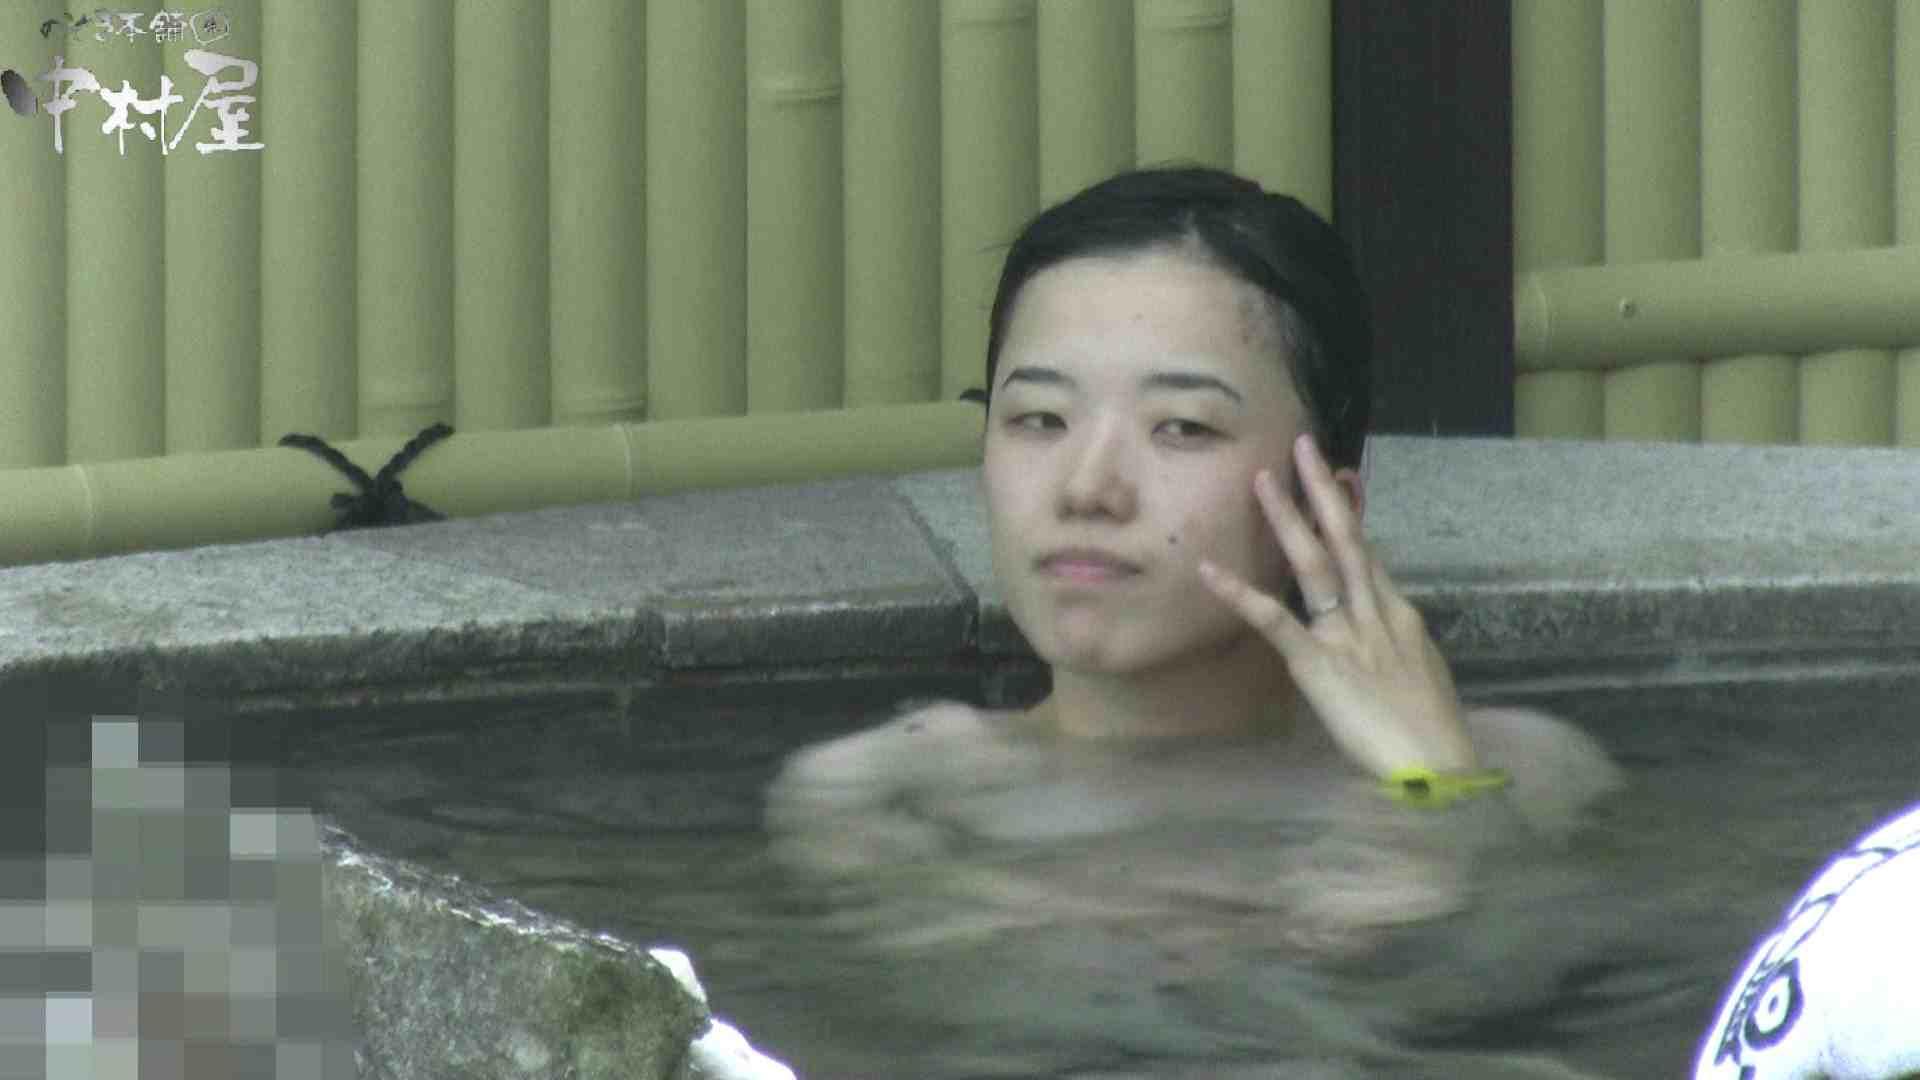 Aquaな露天風呂Vol.908 盗撮  30pic 14